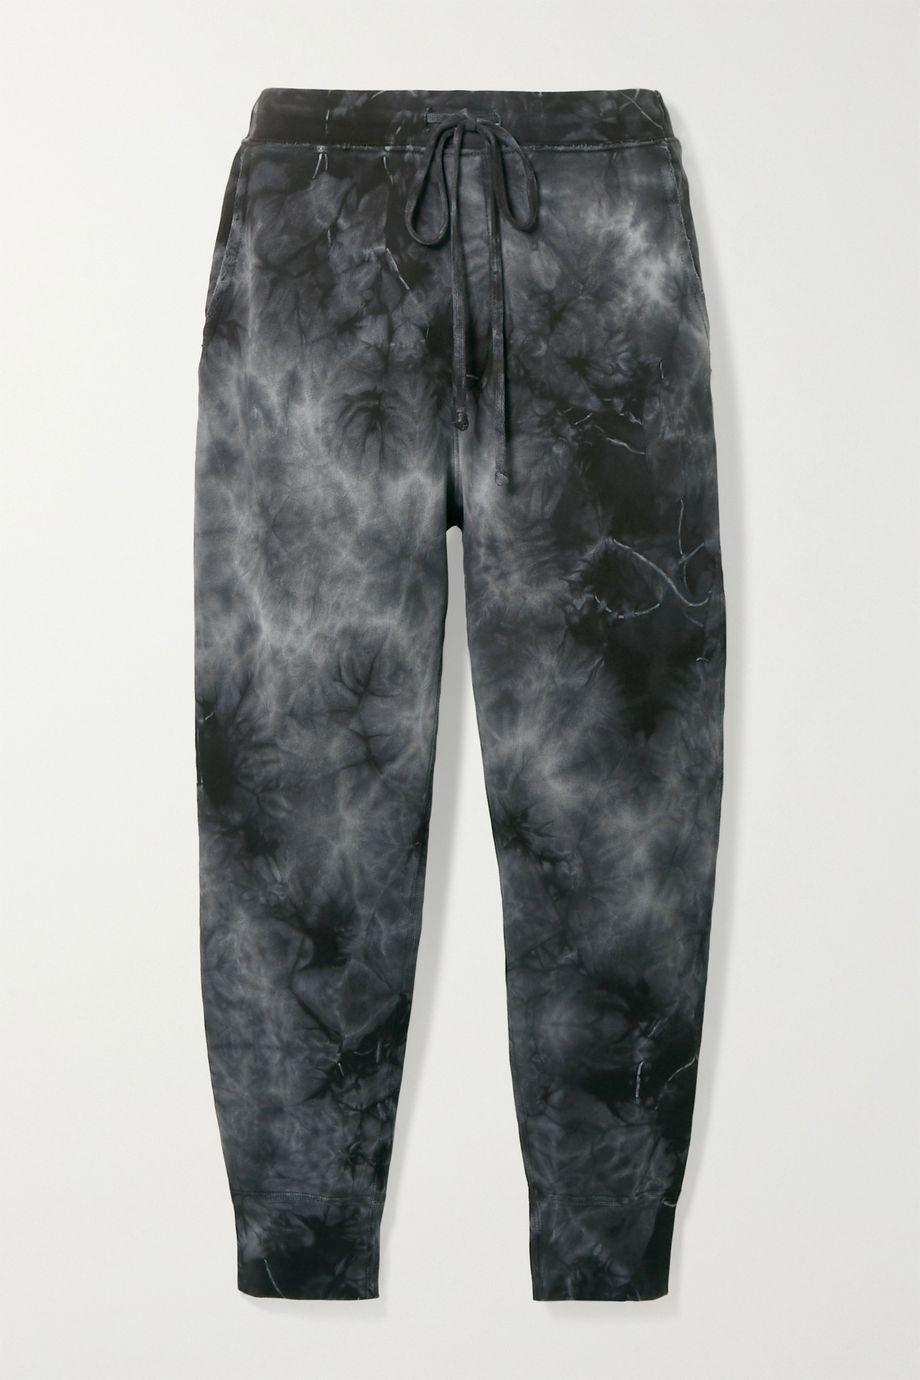 Nili Lotan Nolan cropped distressed tie-dyed cotton-jersey track pants